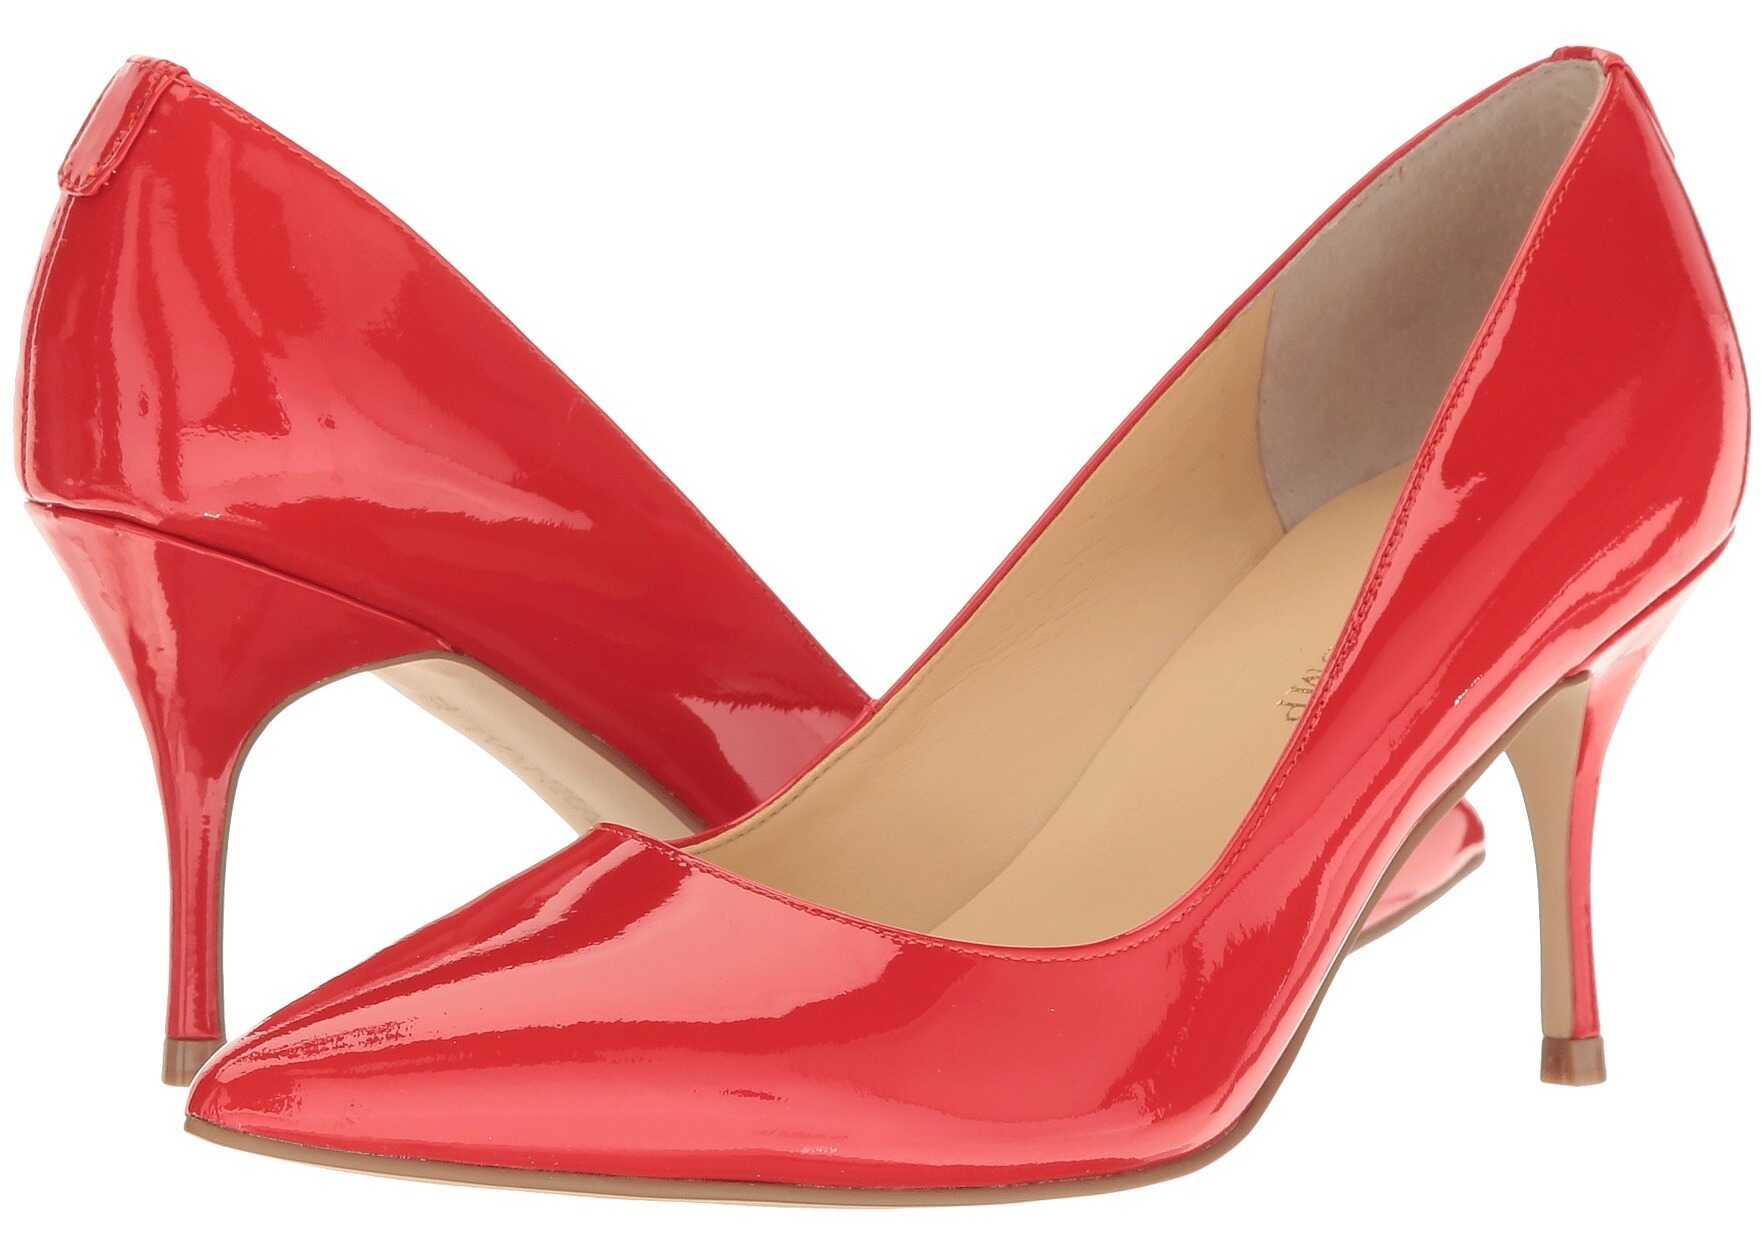 Pantofi Cu Toc Ivanka Trump Boni 7 Medium Red Pate